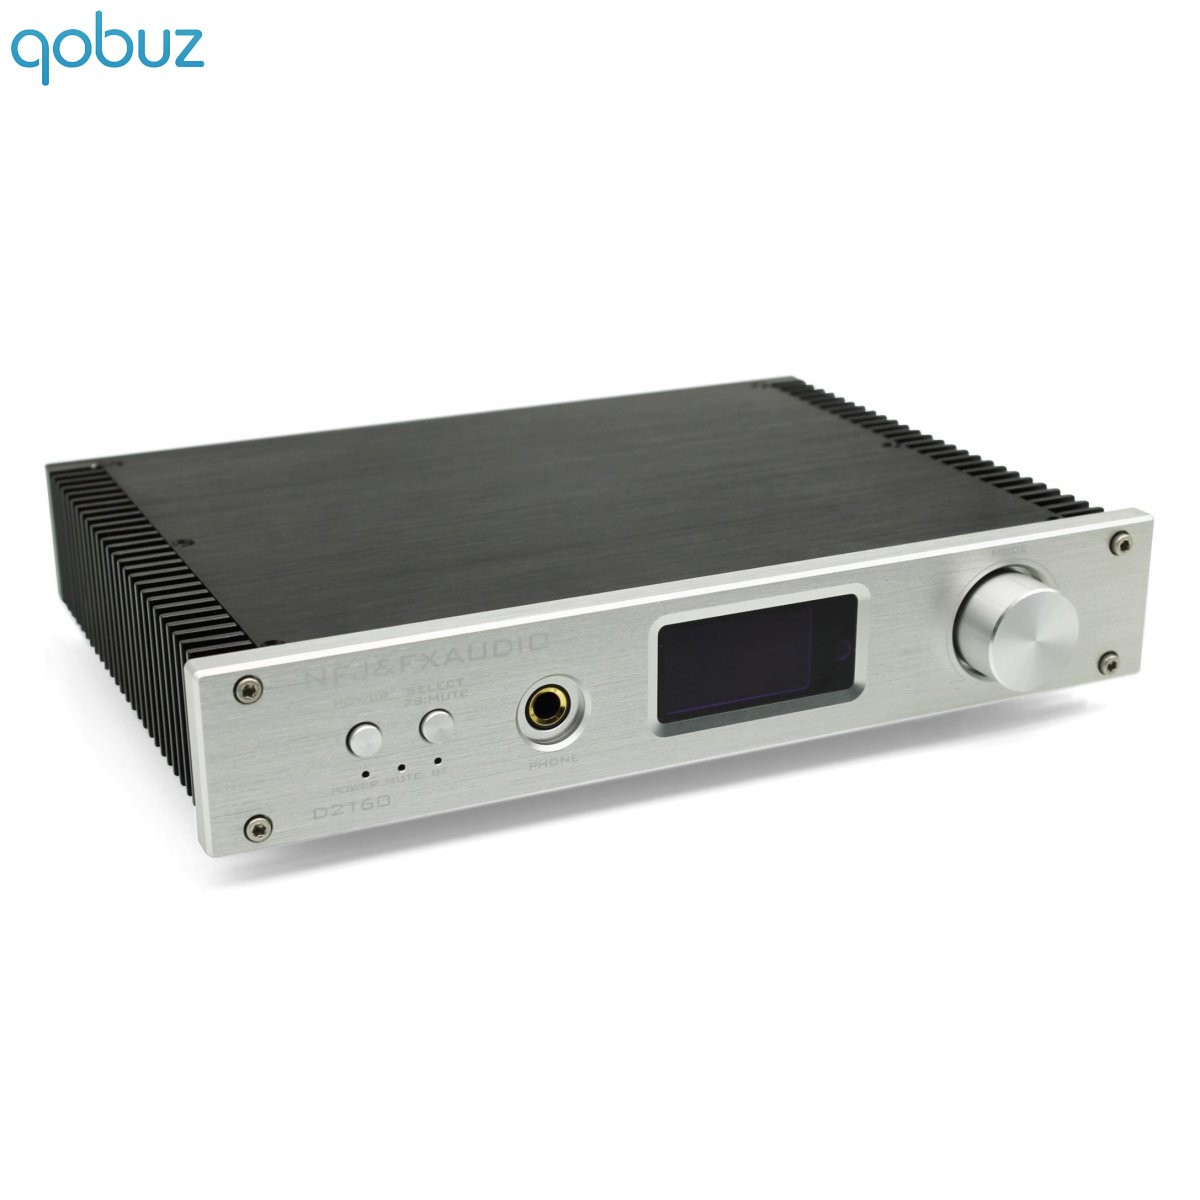 FX-AUDIO D2160 FDA Amplifier Bluetooth 4.2 Class D TAS5614 2x65W 8 Ohms Silver